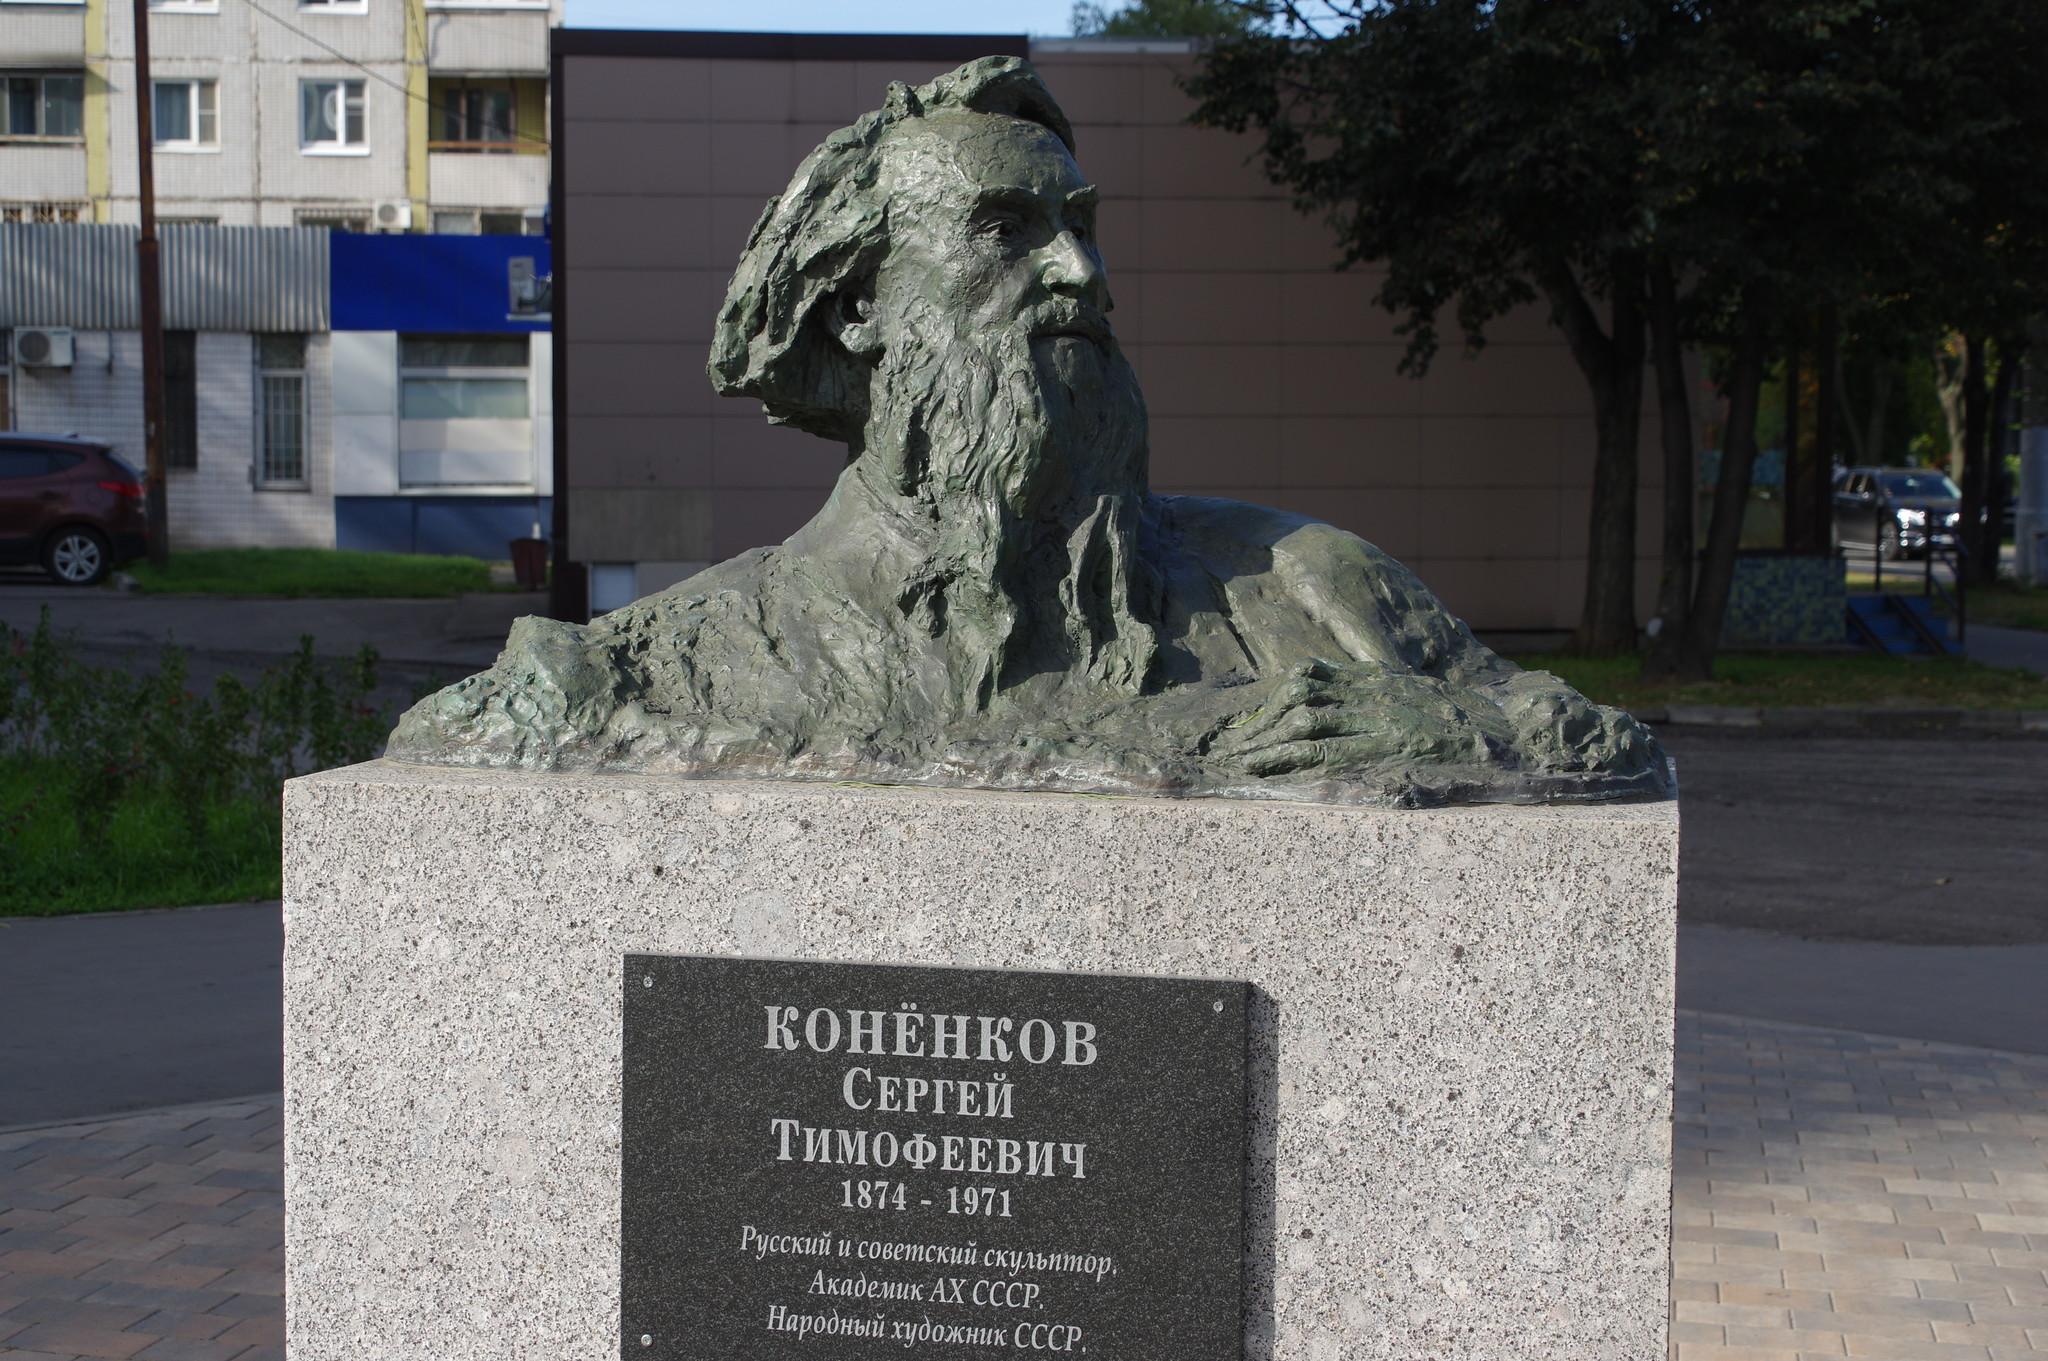 Бюст Сергея Тимофеевича Конёнкова в парке скульптур на улице Конёнкова